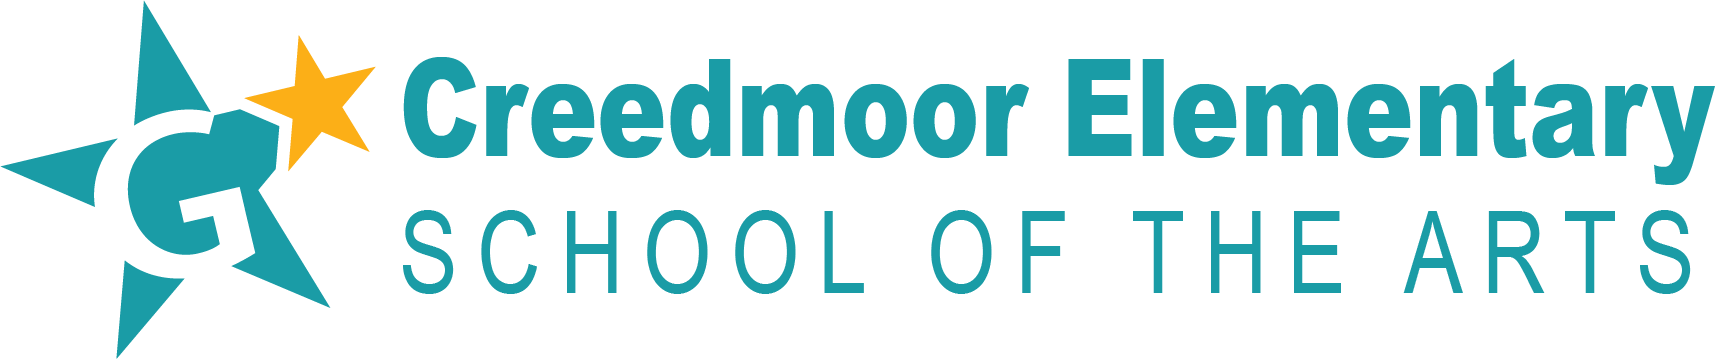 Creedmoor Elementary